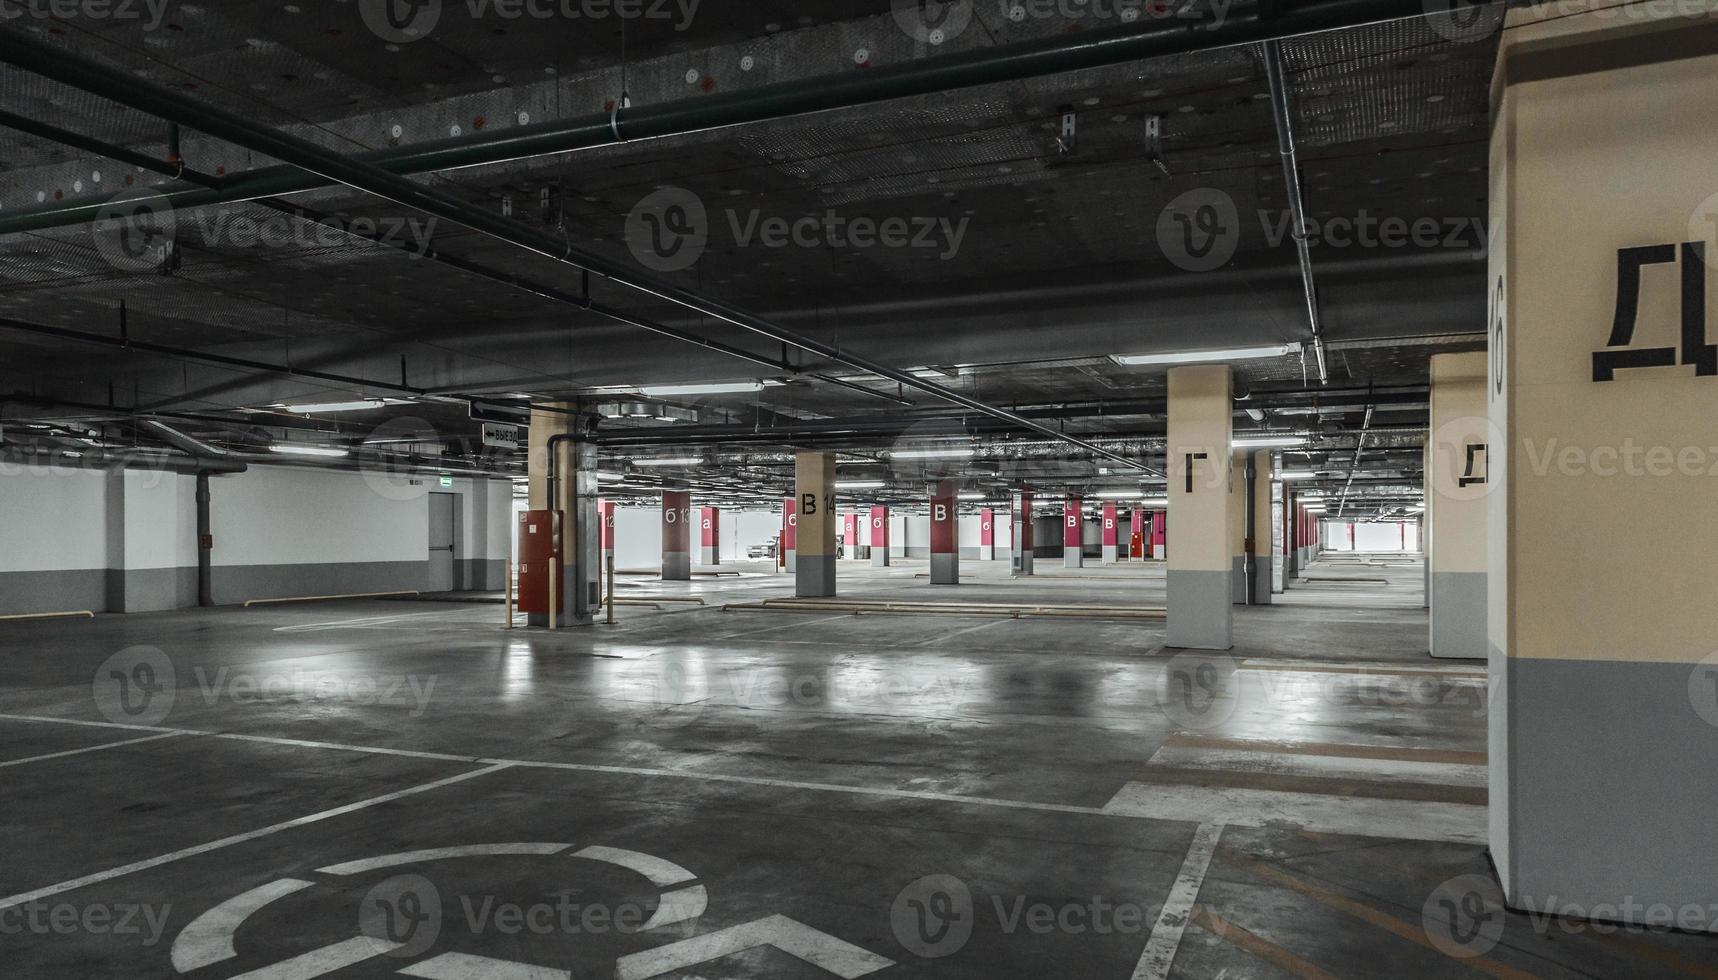 mur de parking vide. milieu urbain, industriel photo